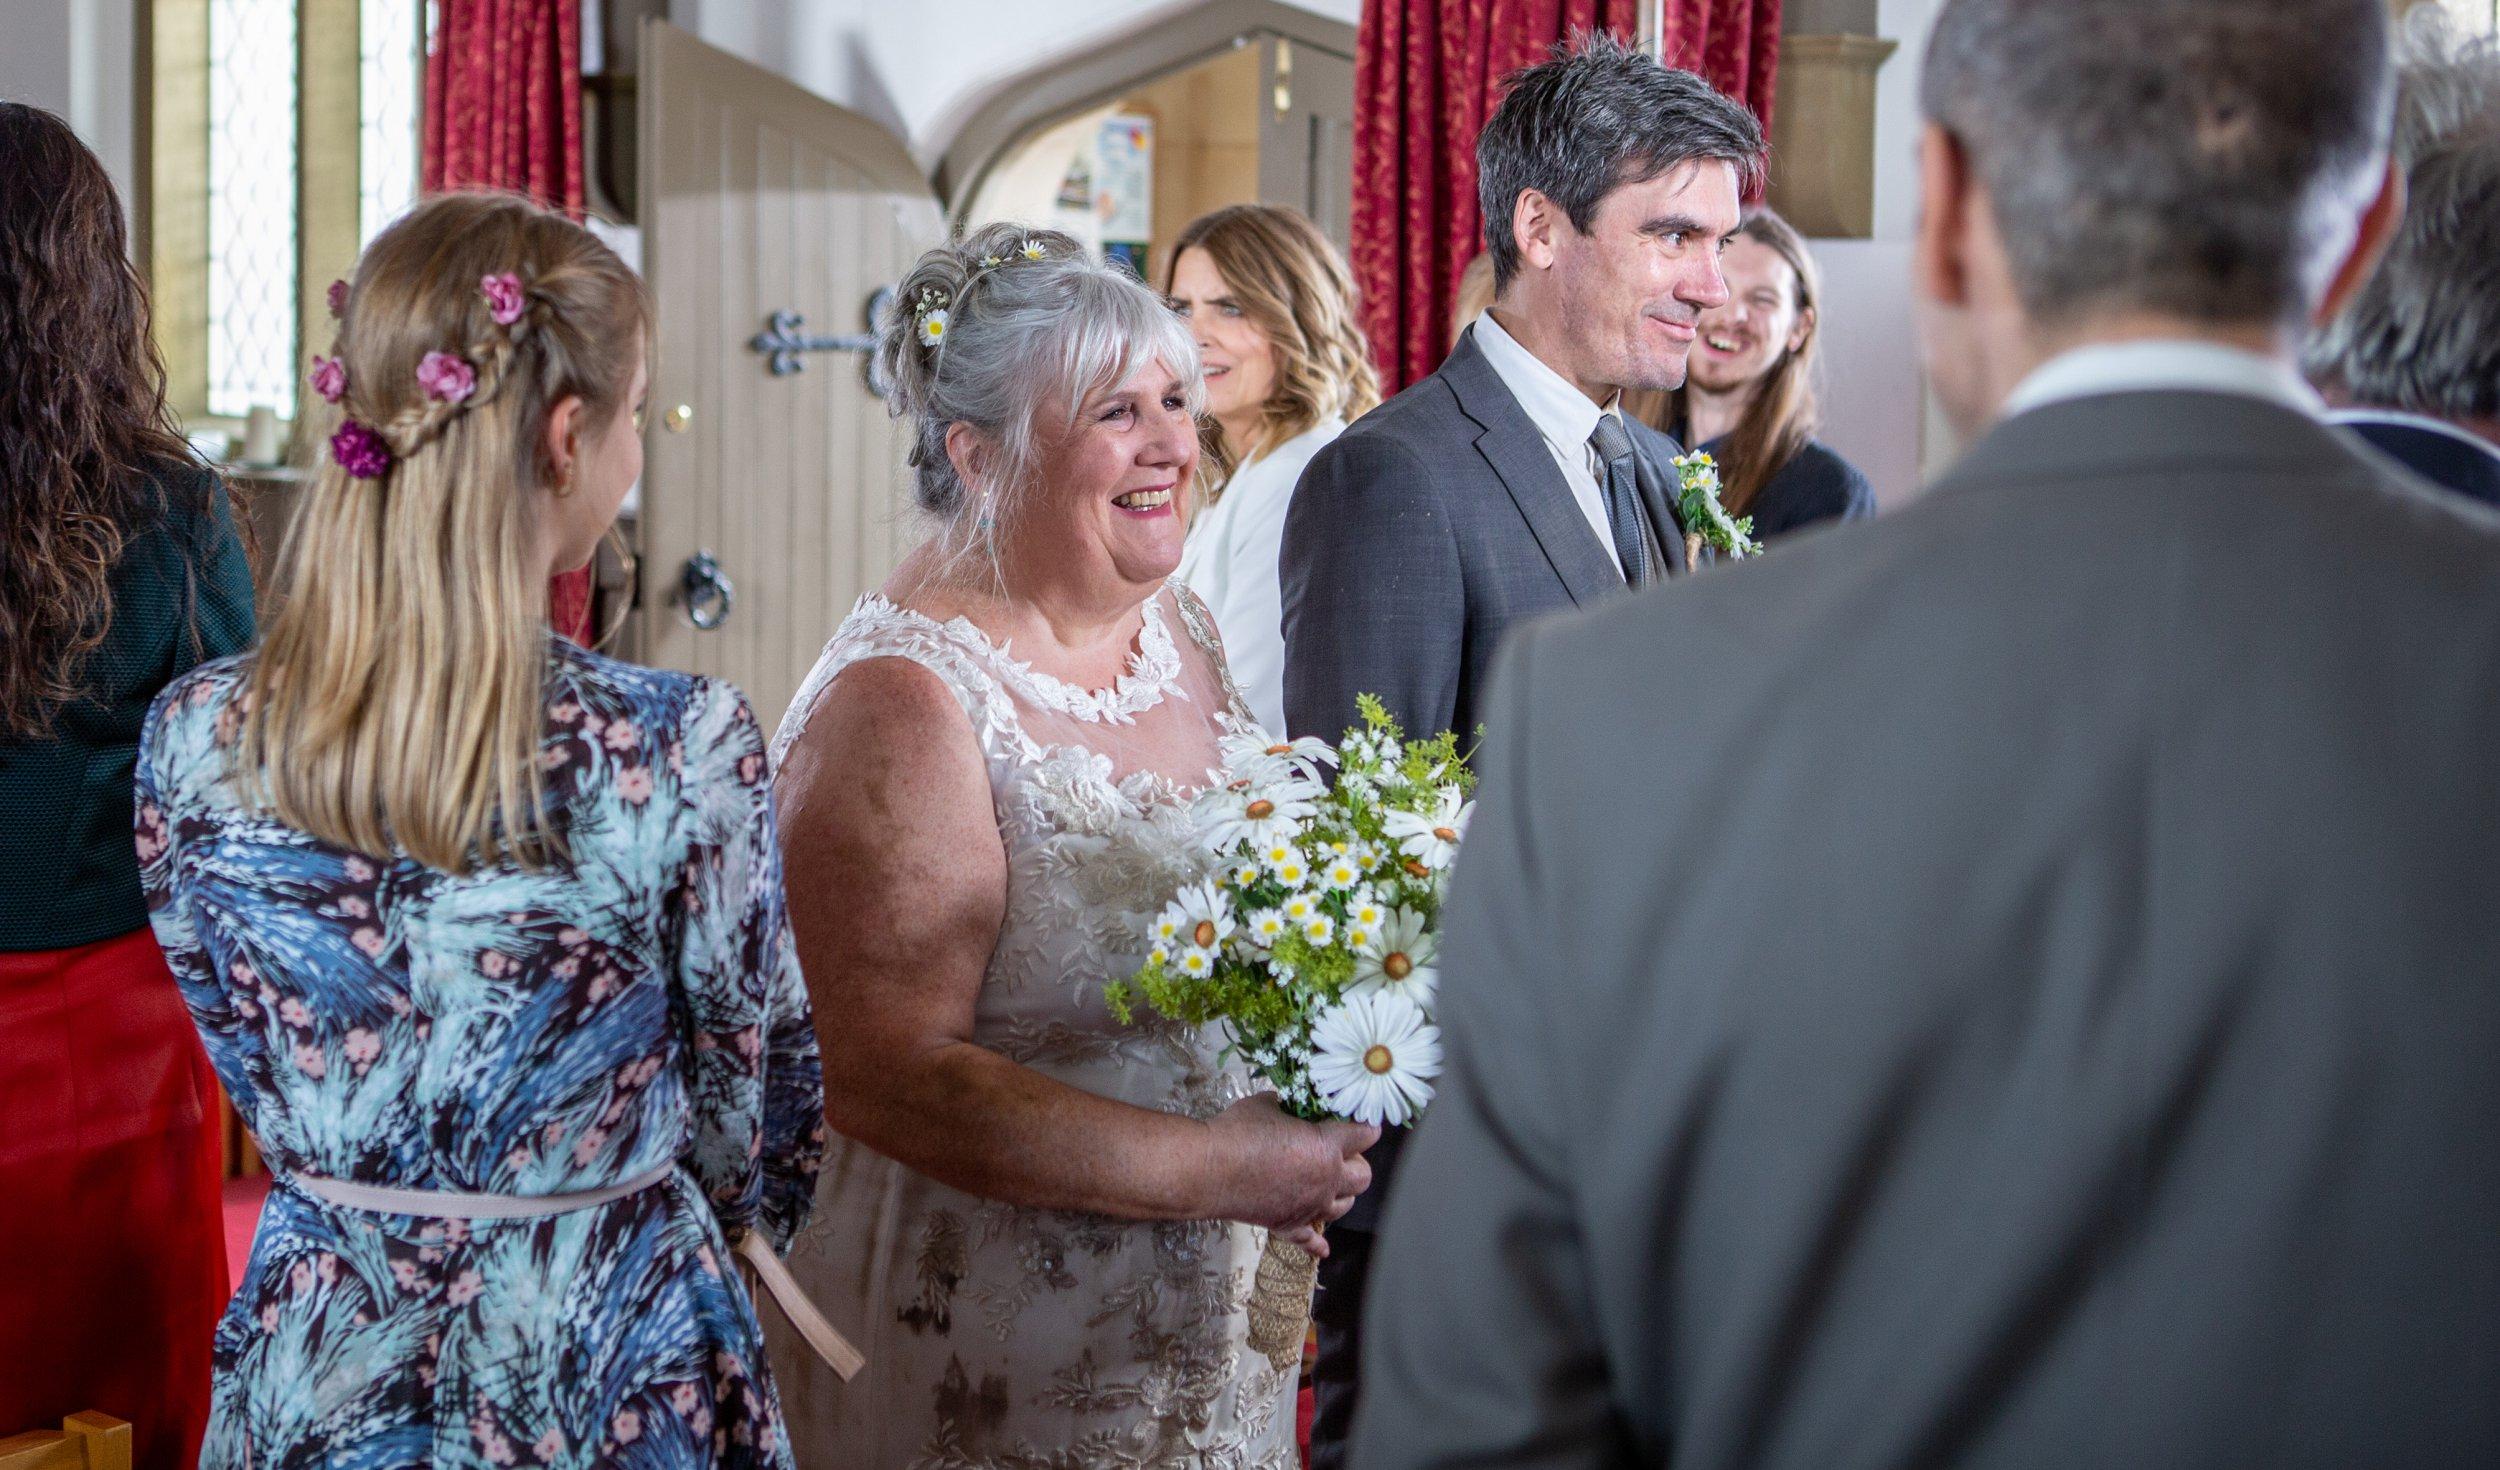 Emmerdale spoilers: Huge Dingle wedding as Zak and Lisa exchange their vows ahead of death storyline